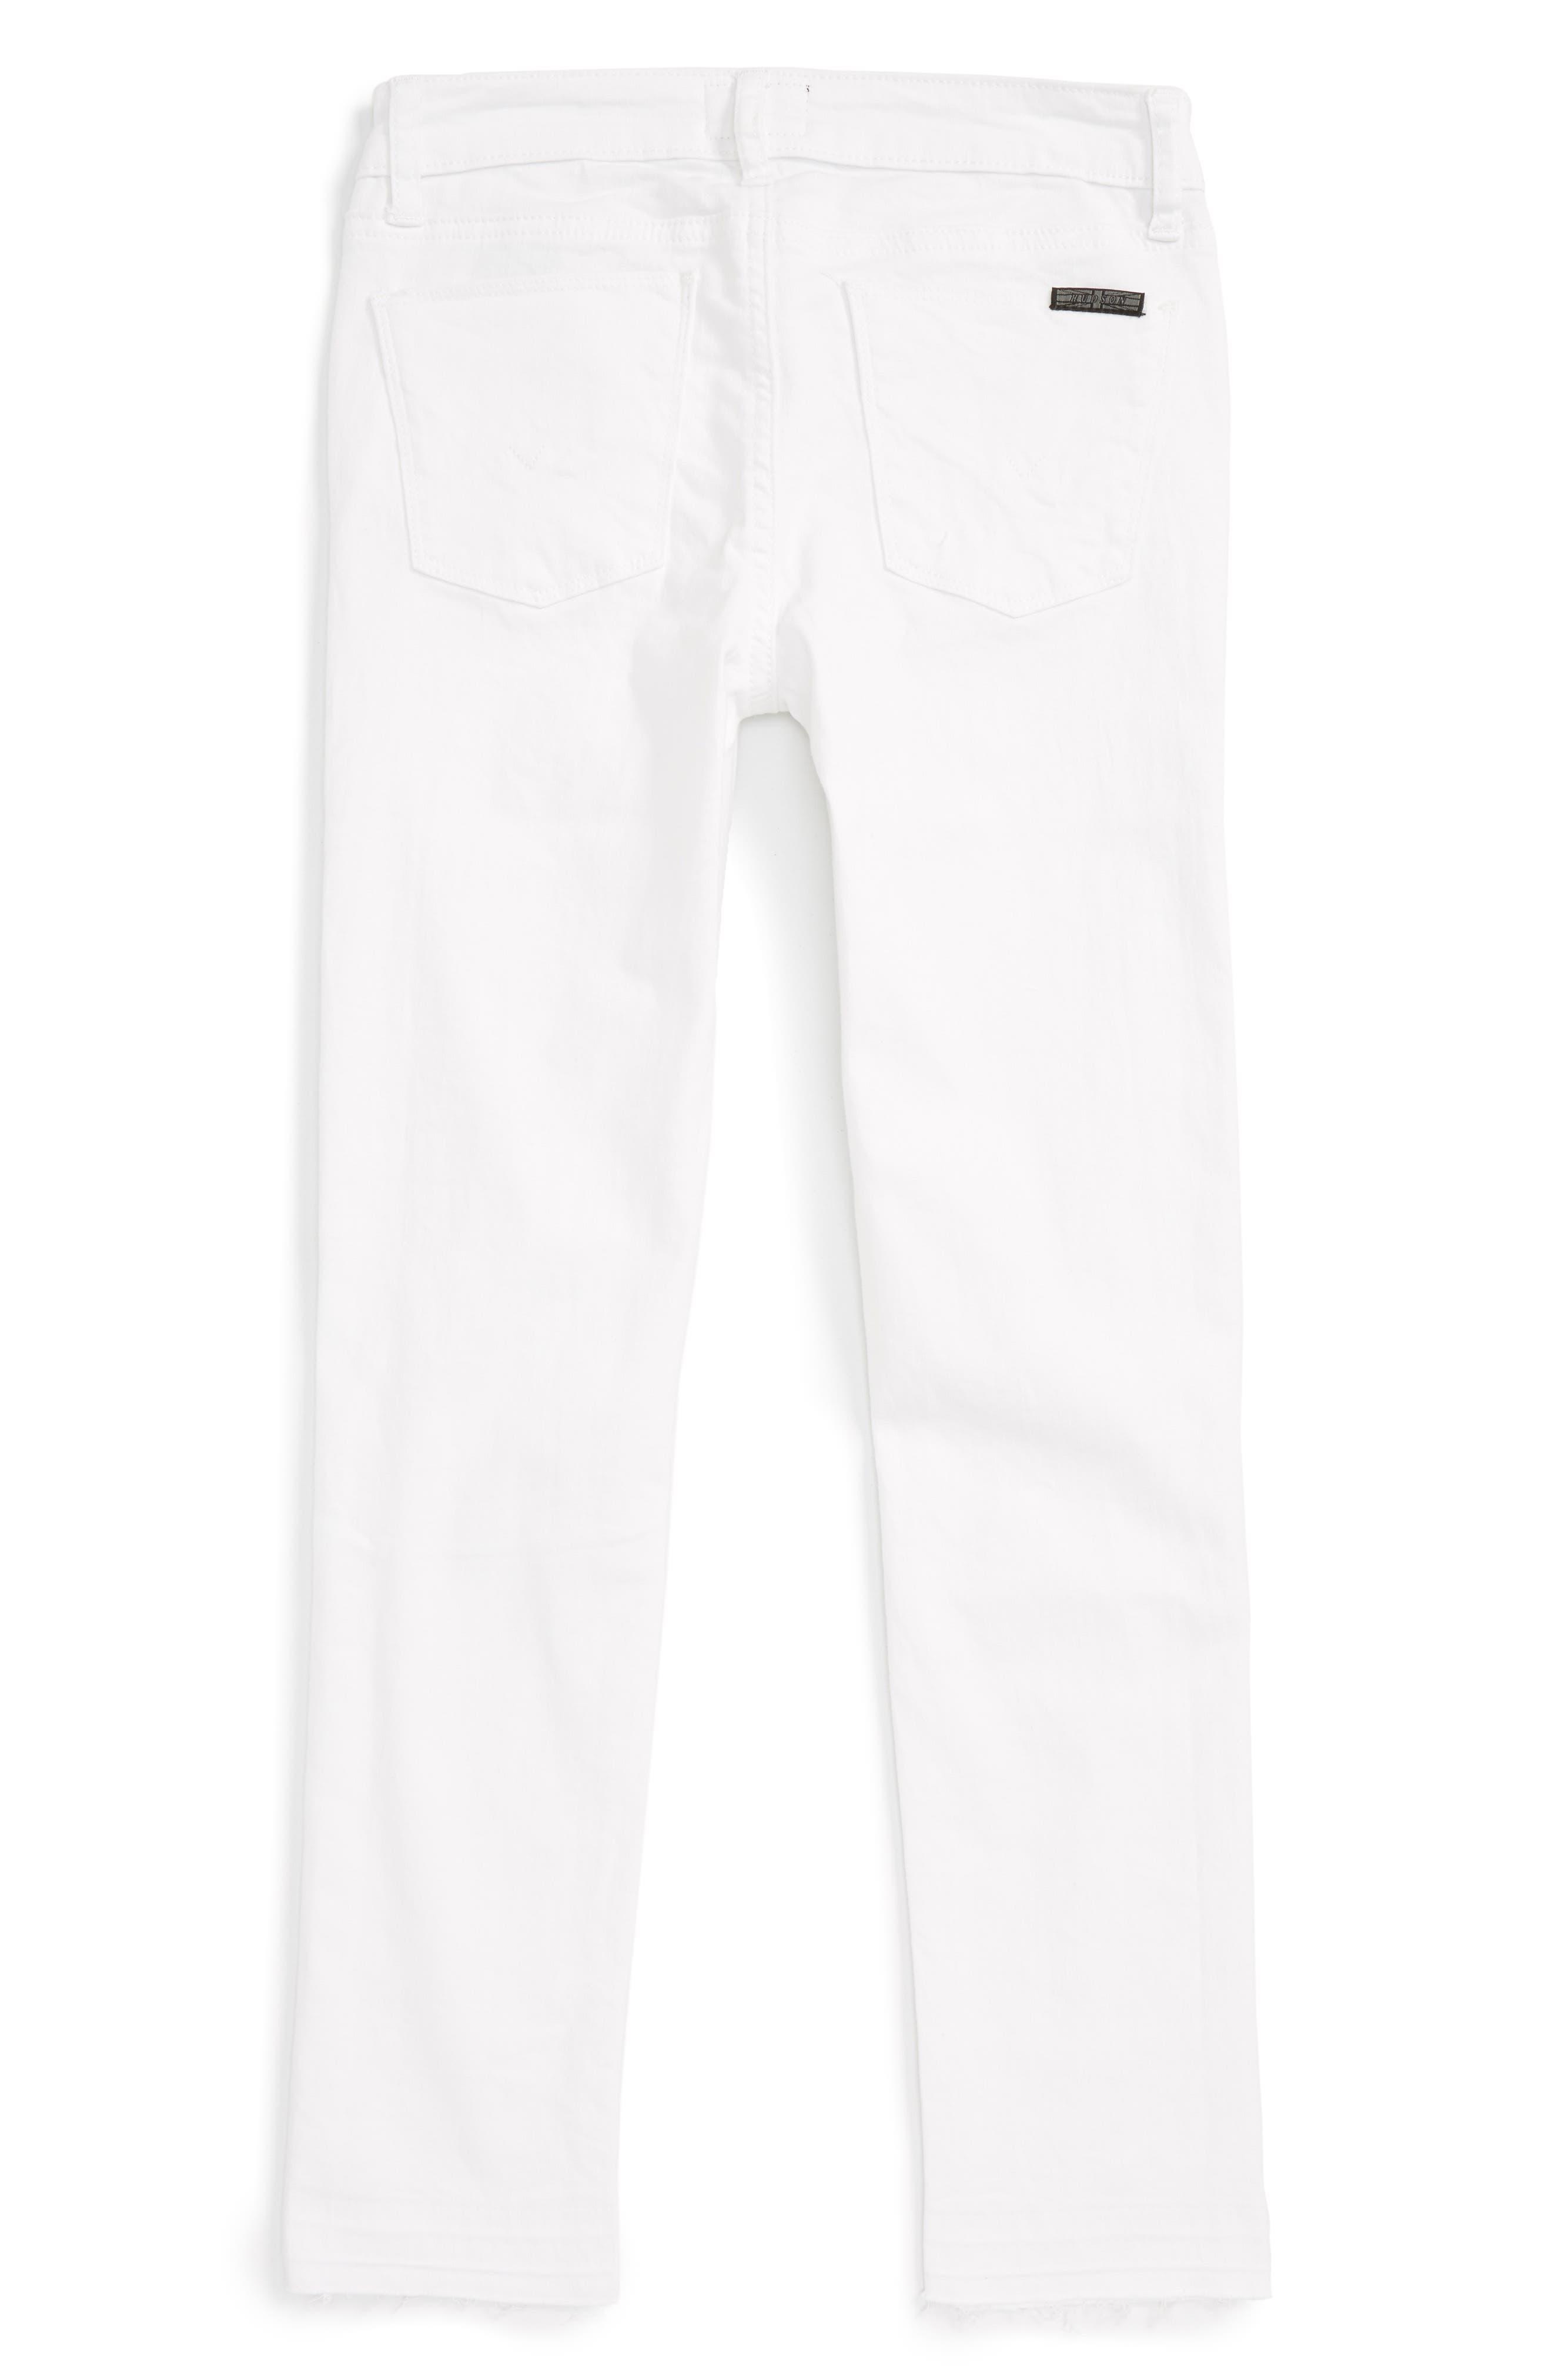 Seaside Crop Skinny Jeans,                             Alternate thumbnail 2, color,                             100